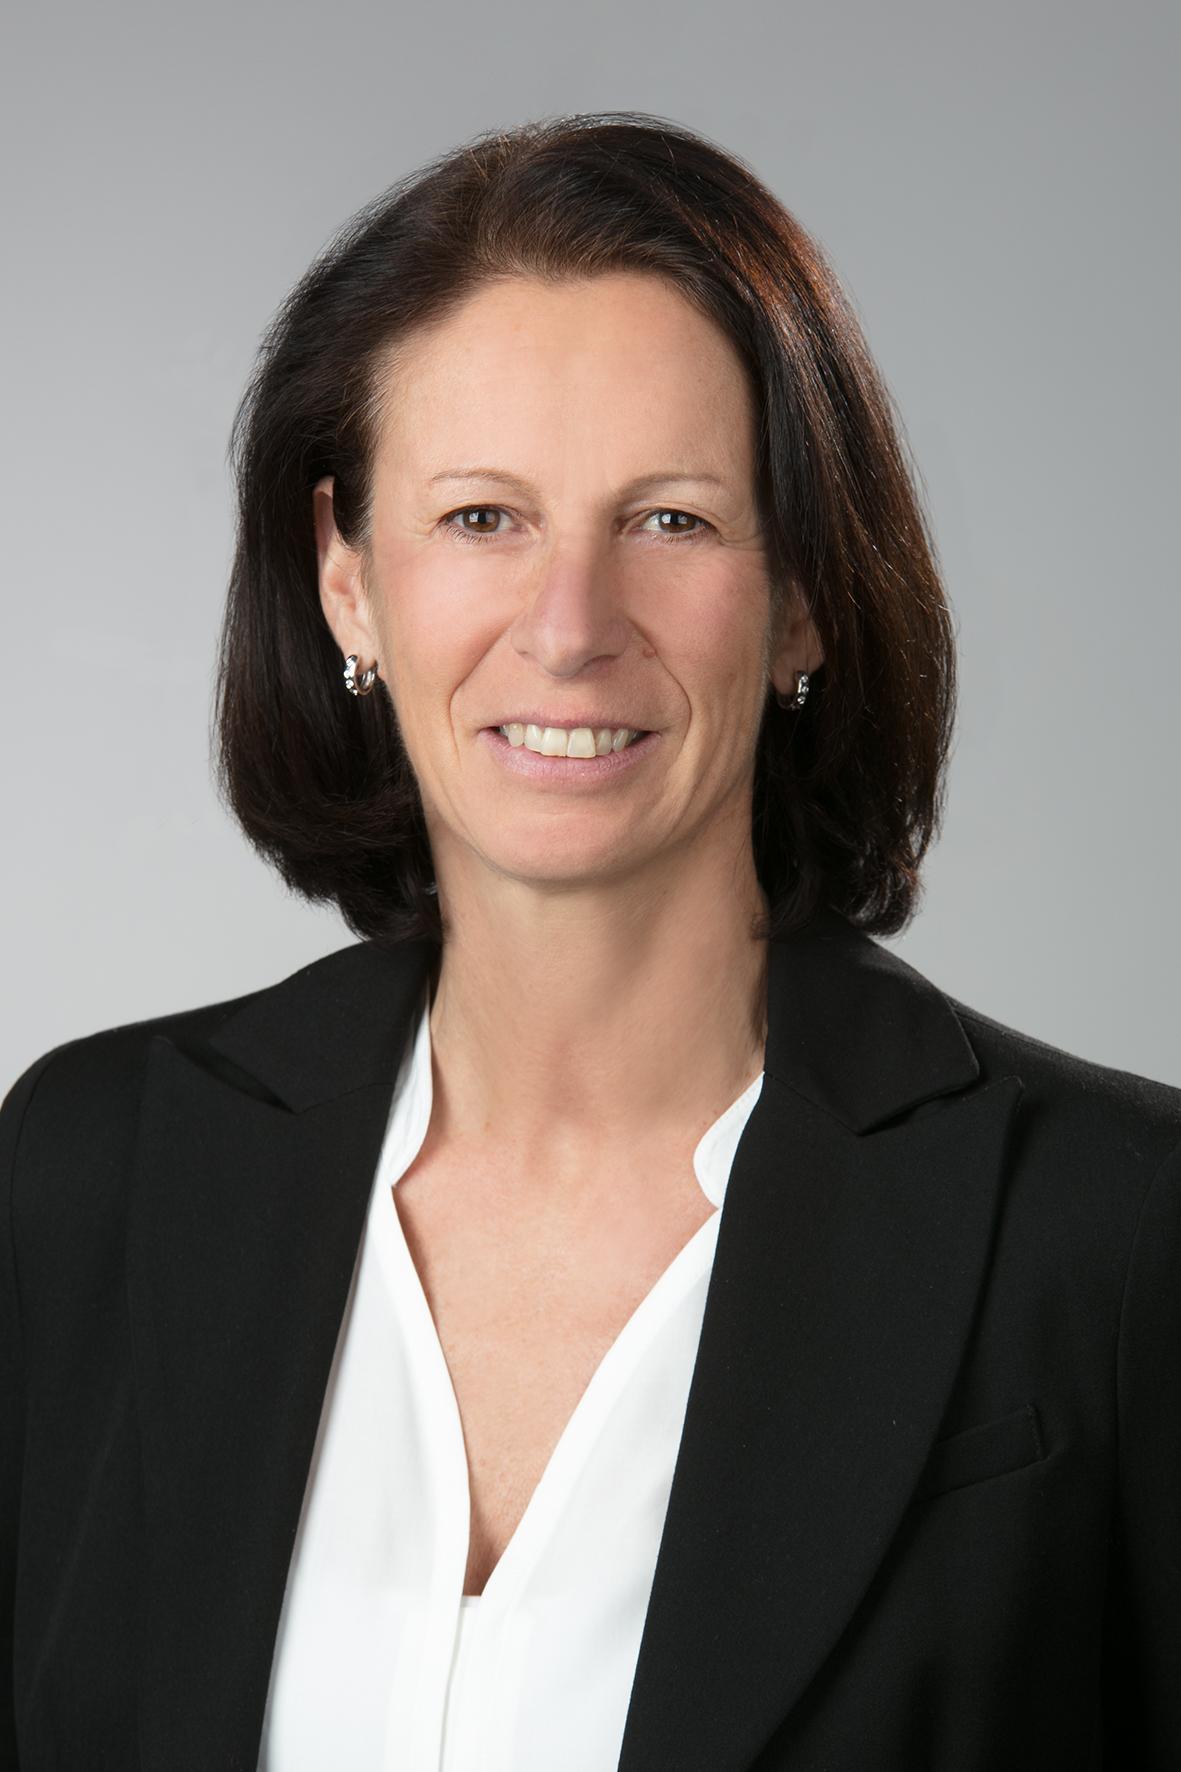 Andrea Karcher